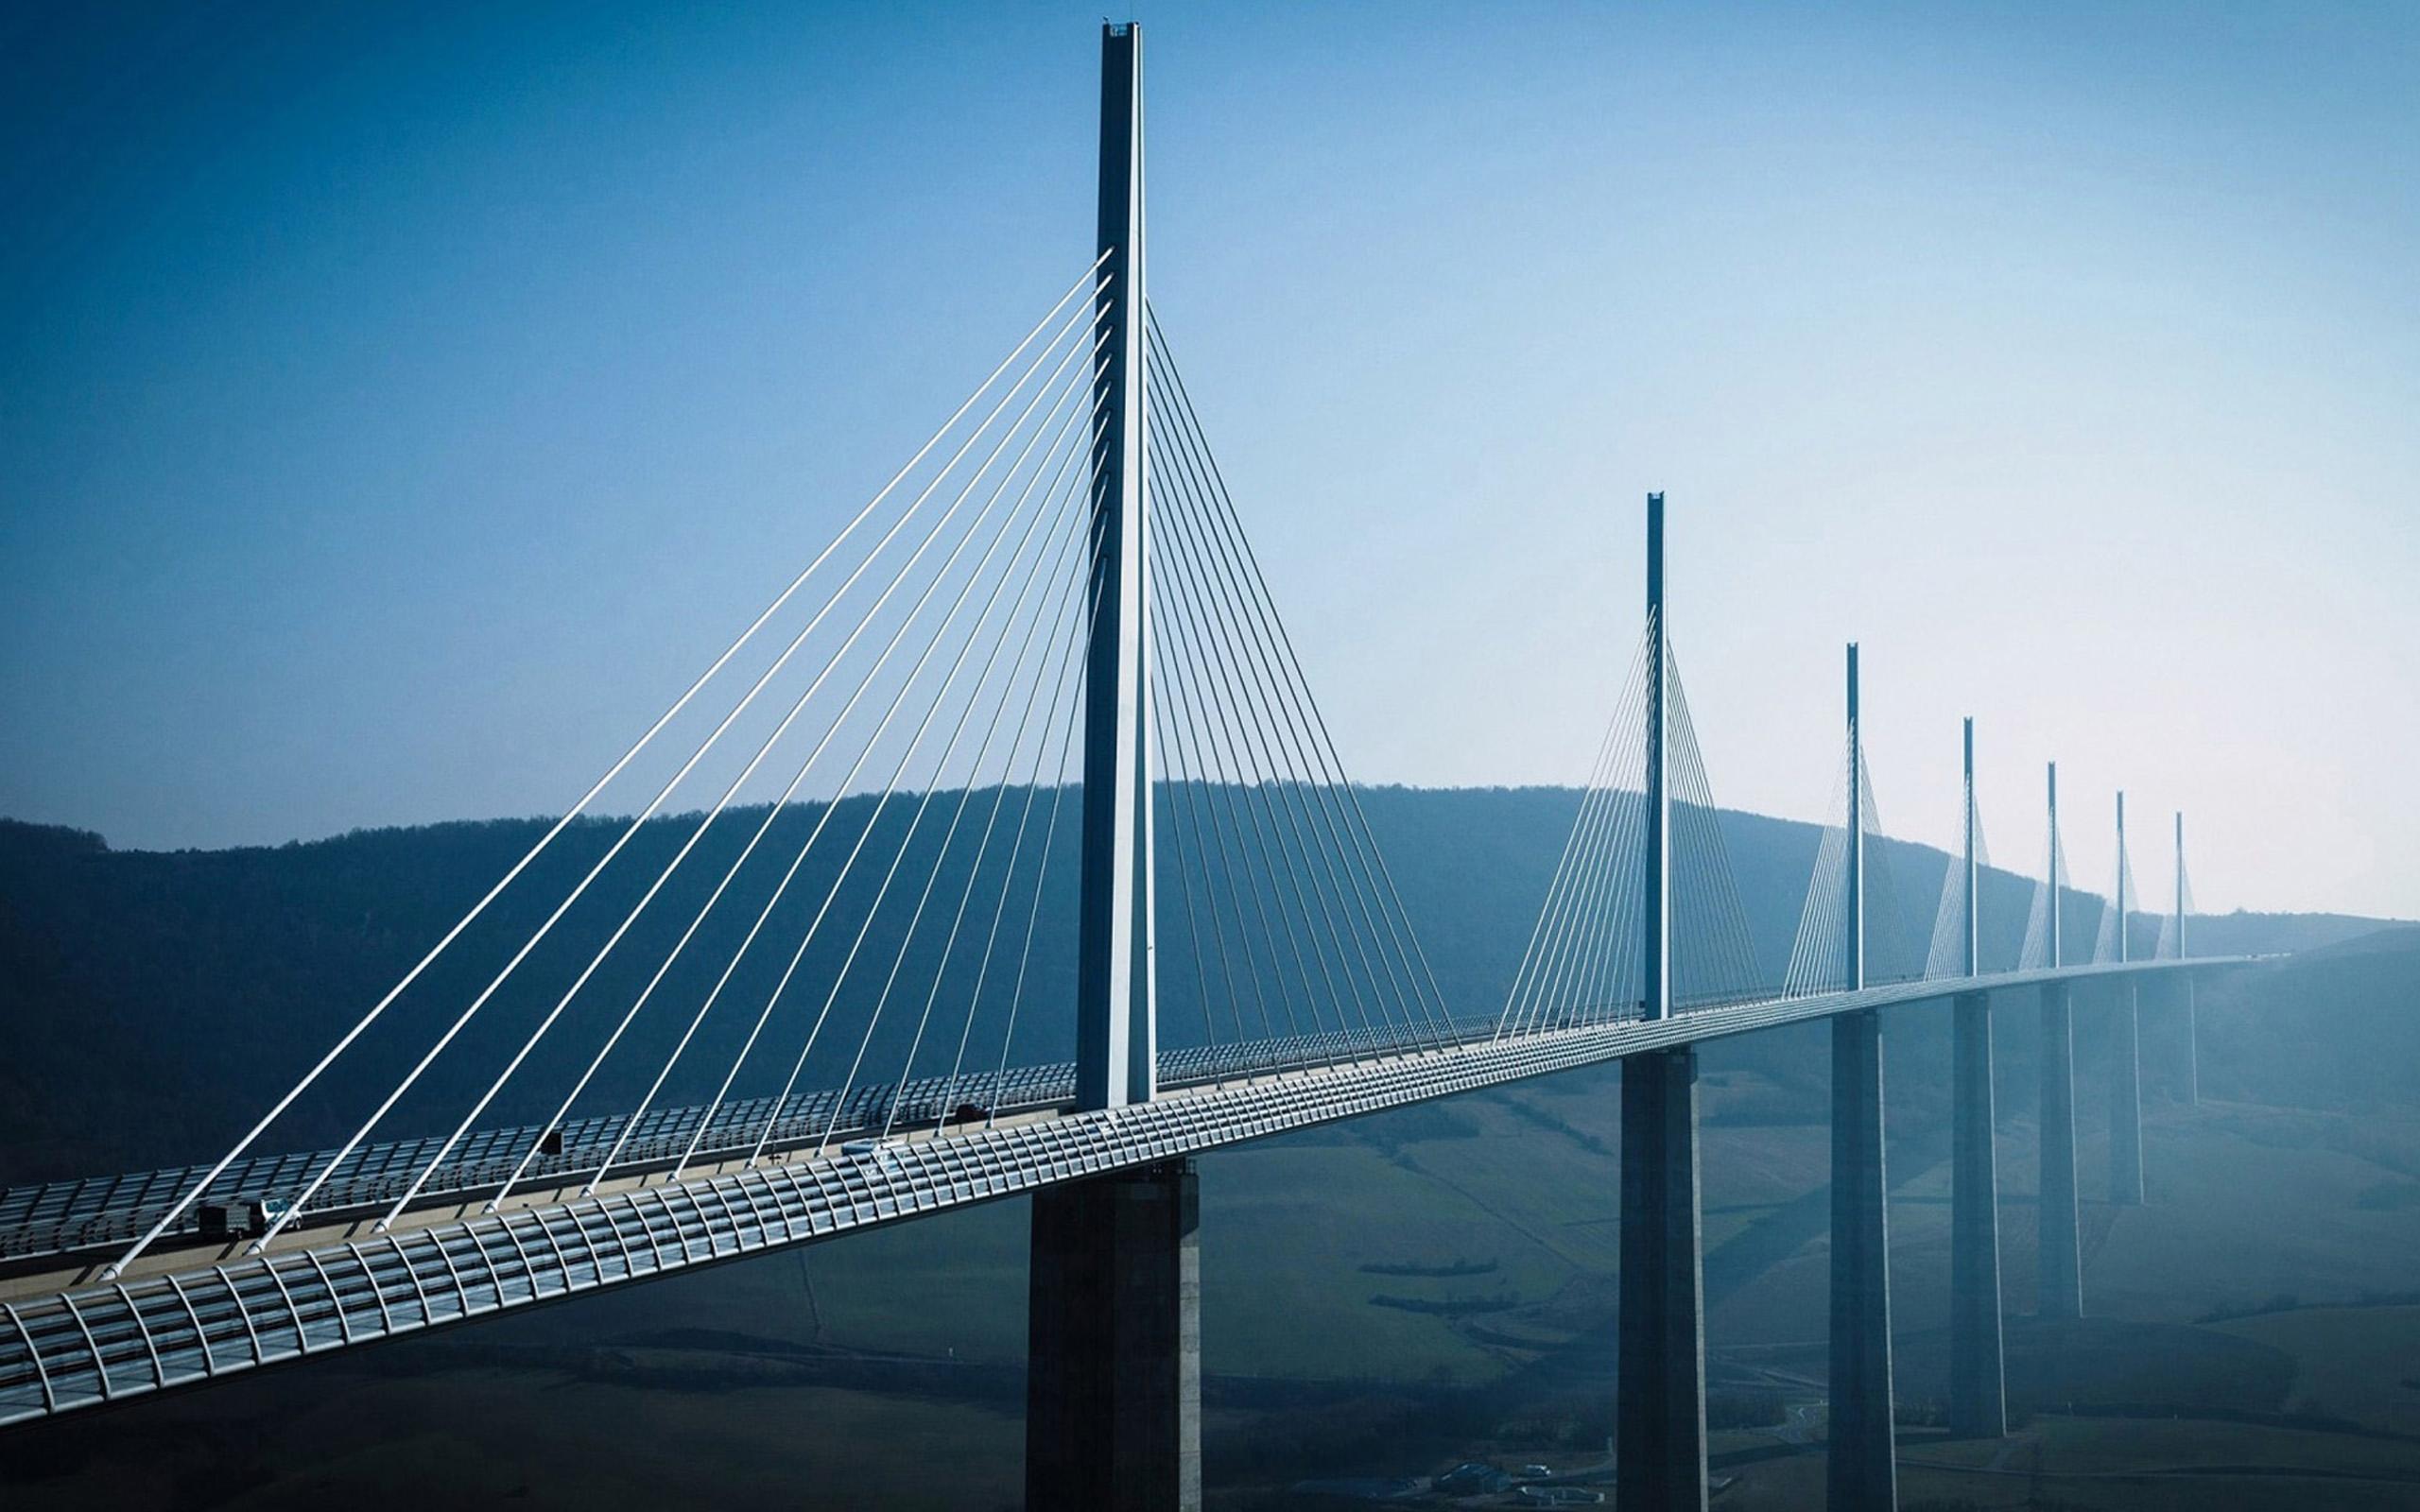 Modern Large Bridge Architecture HD Wallpaper 22668 Wallpaper 2560x1600